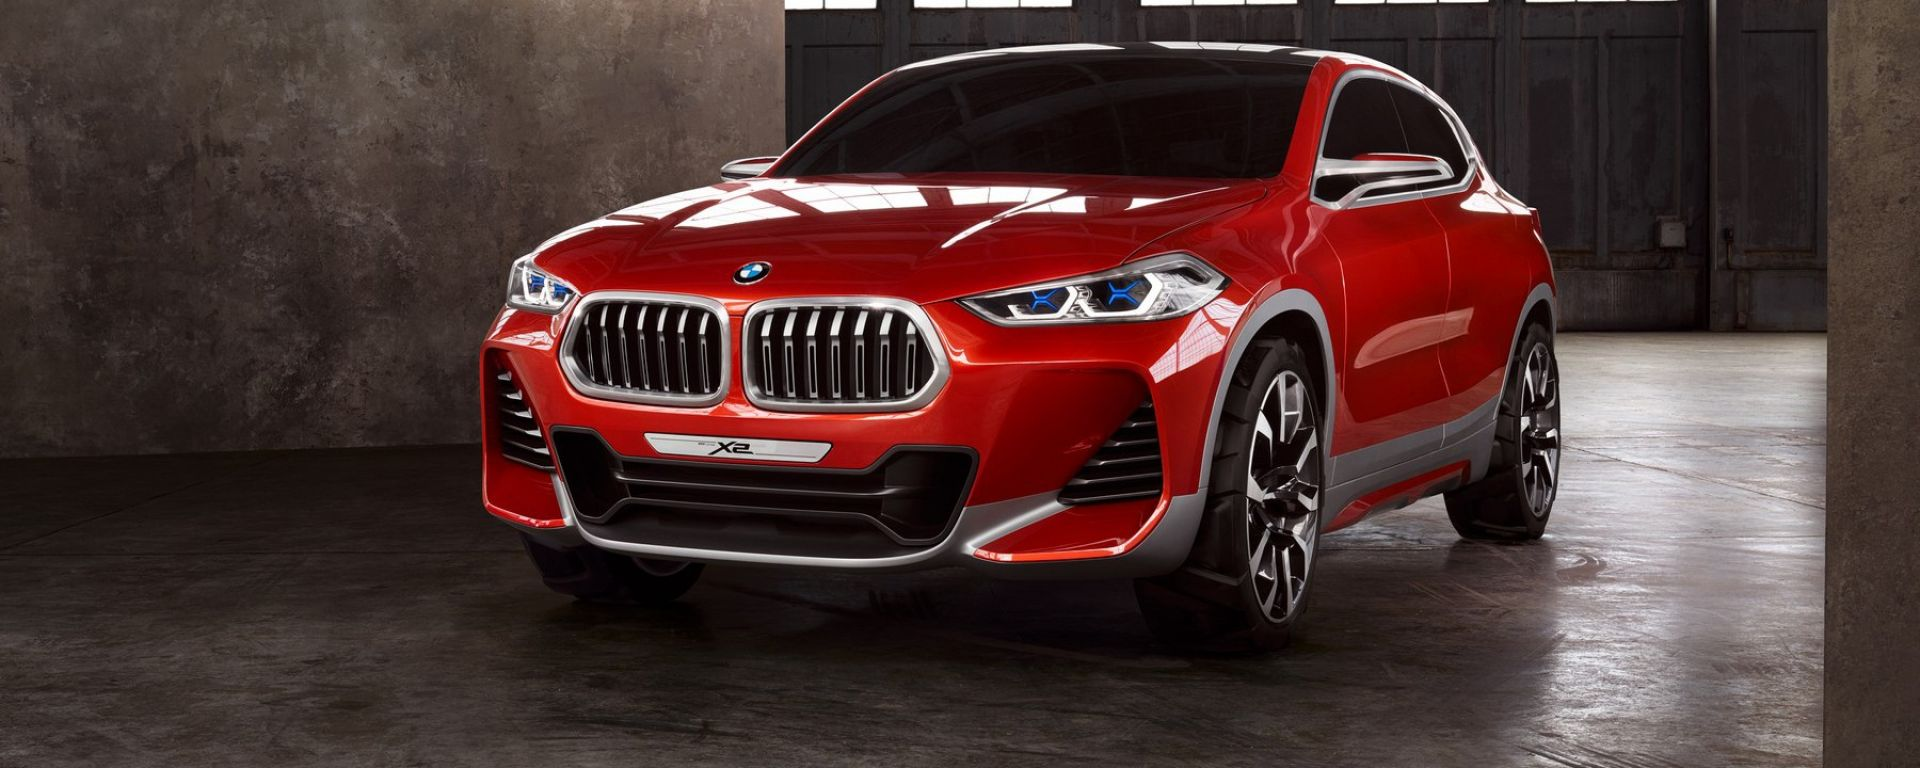 BMW Concept X2: vista 3/4 frontale